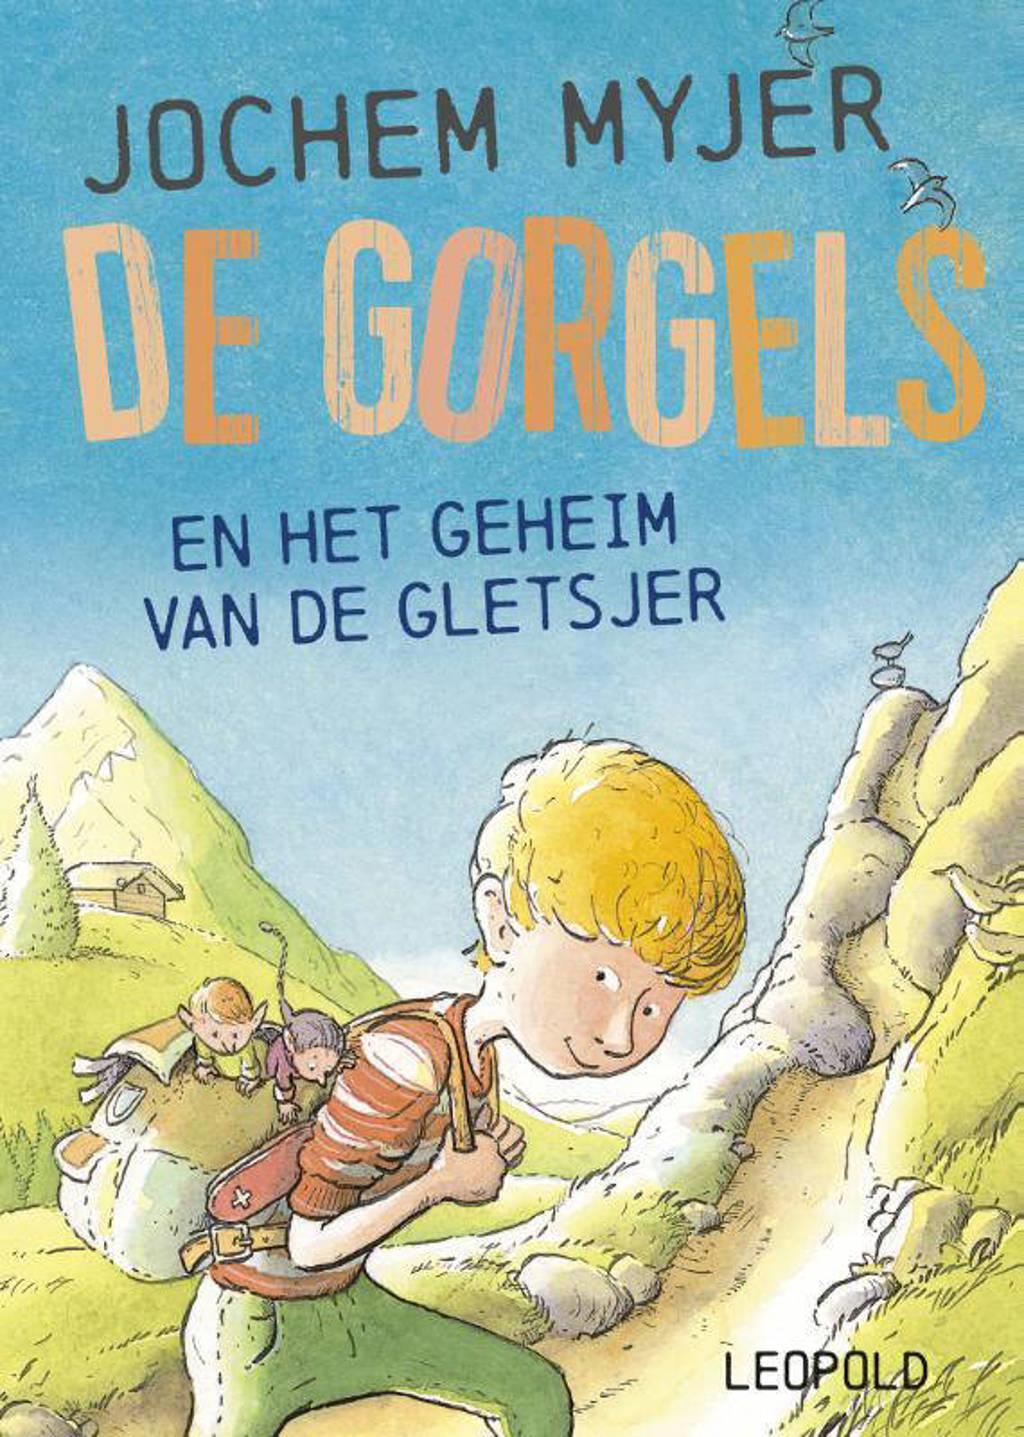 Gorgels: De Gorgels en het geheim van de gletsjer - Jochem Myjer